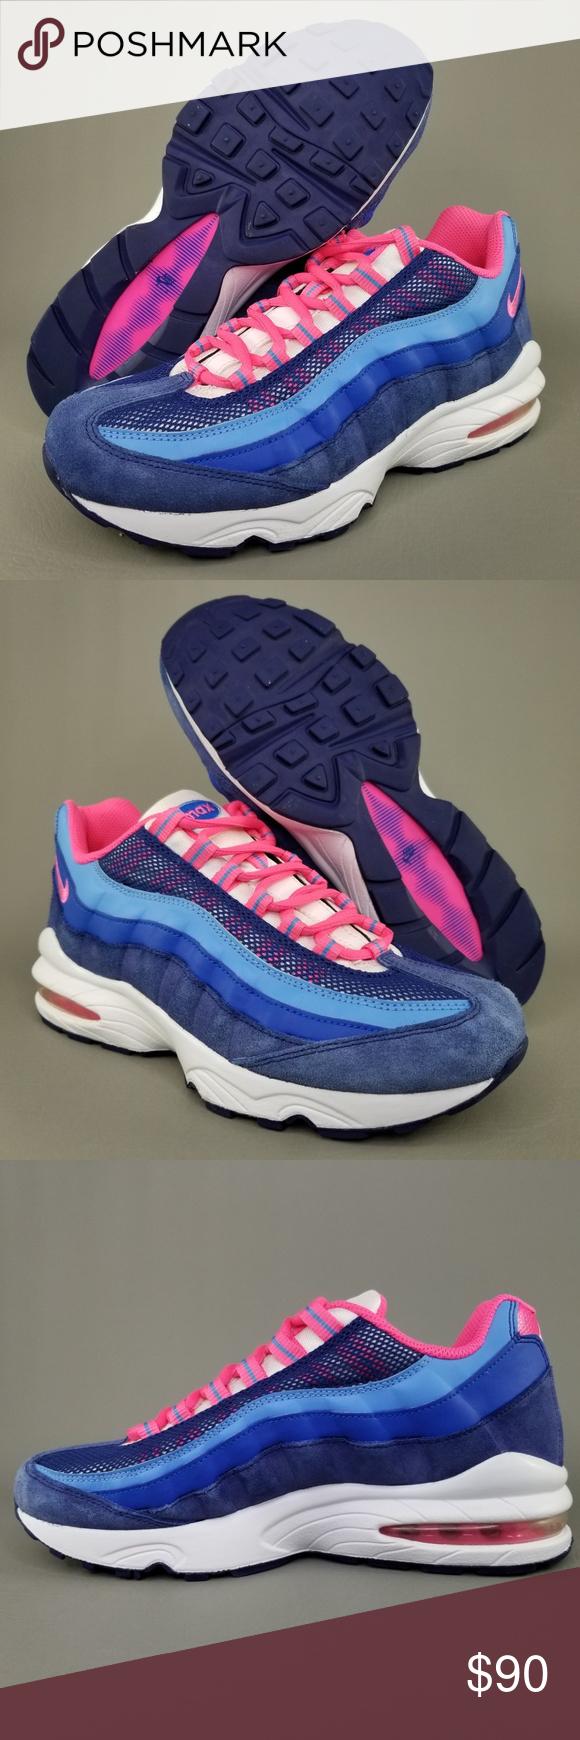 best website df9a0 7934e Nike Air Max 95 LE GS Athletic Shoes 7Y Womens 8.5 Nike Air Max 95 LE